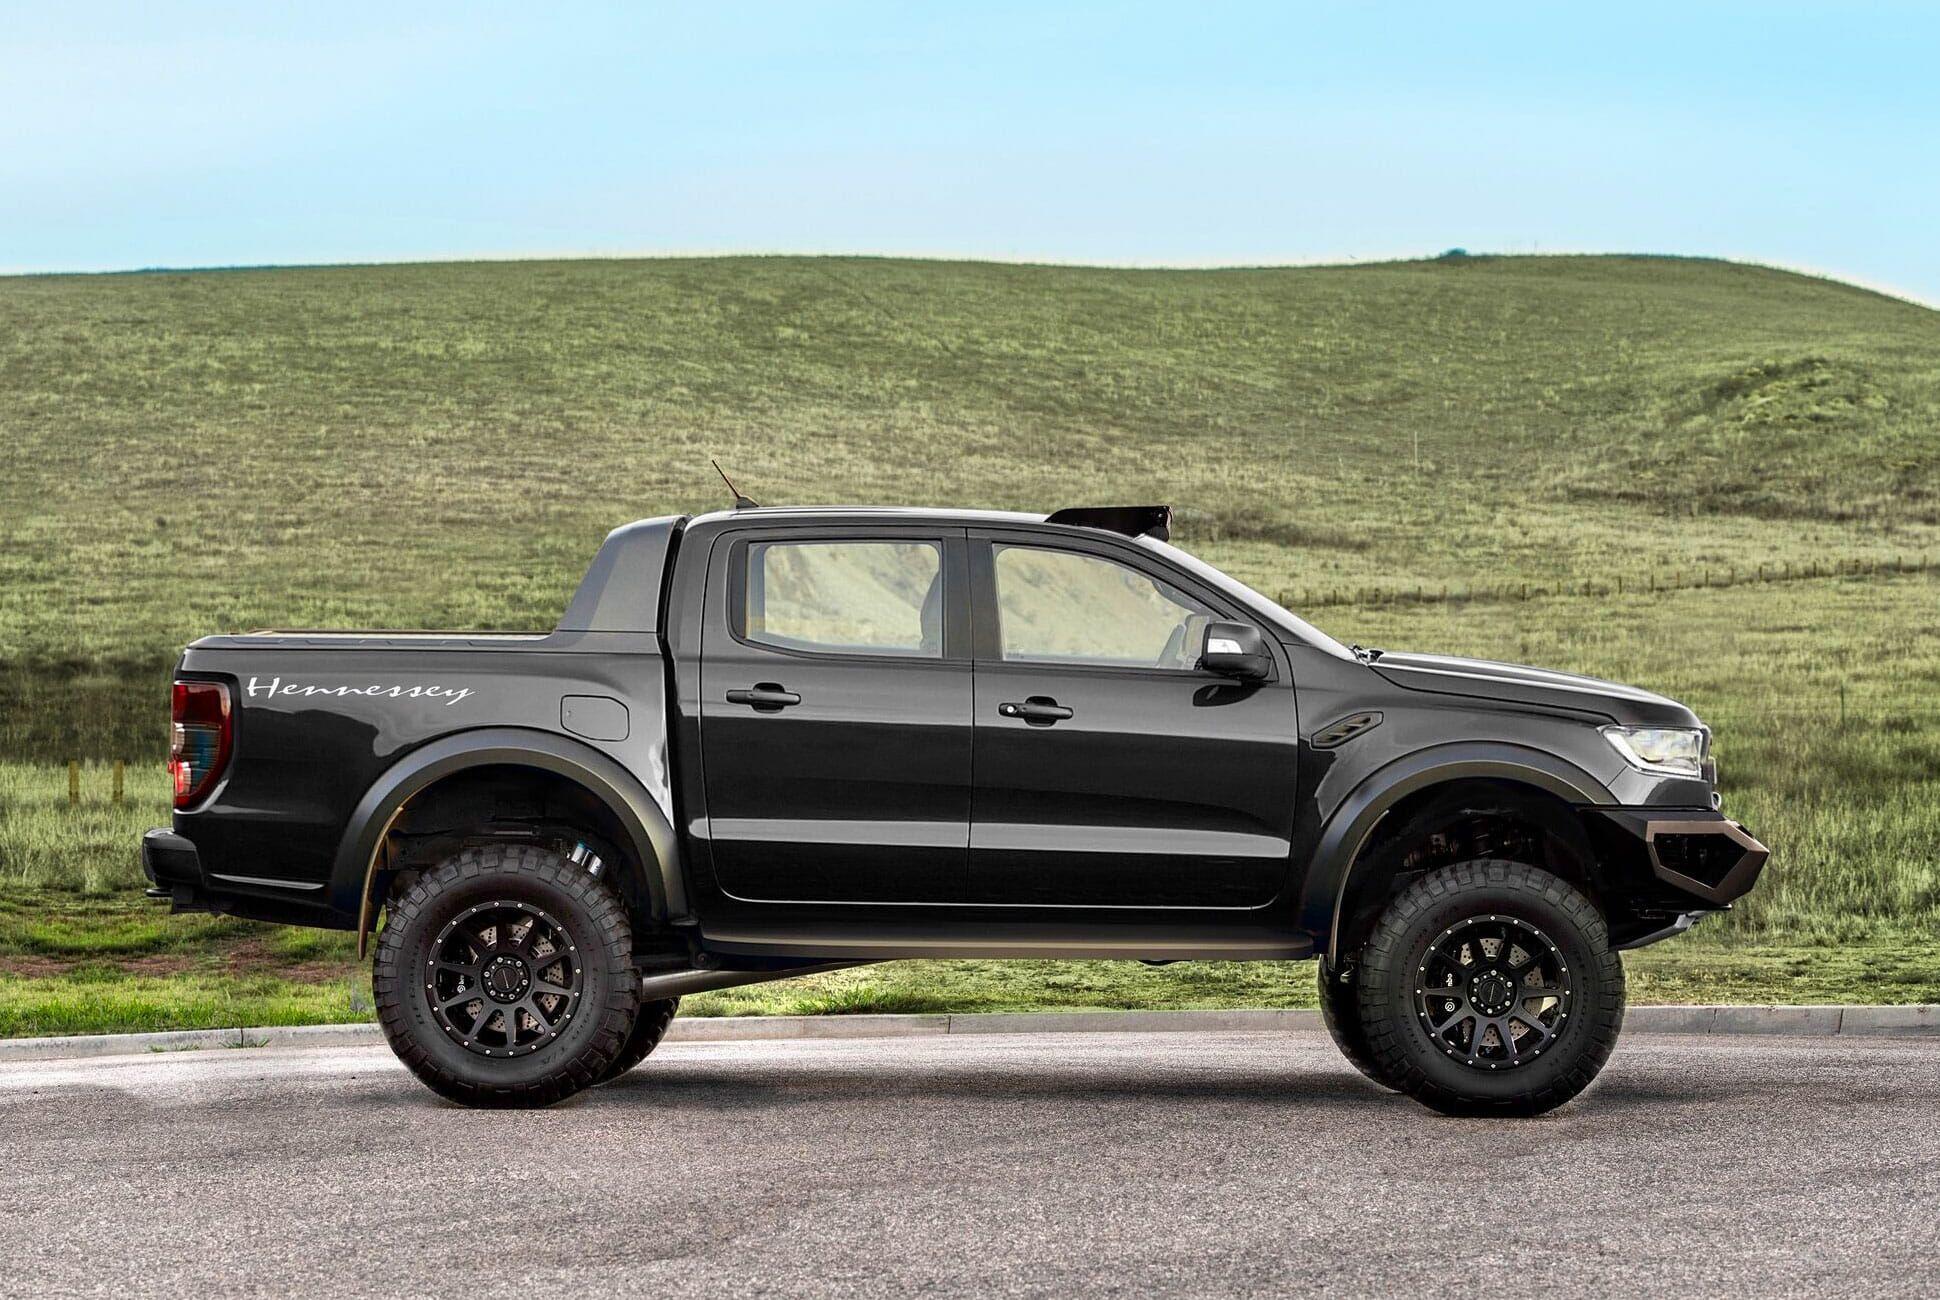 Hennessey-Ranger-Raptor-Gear-Patrol-slide-3